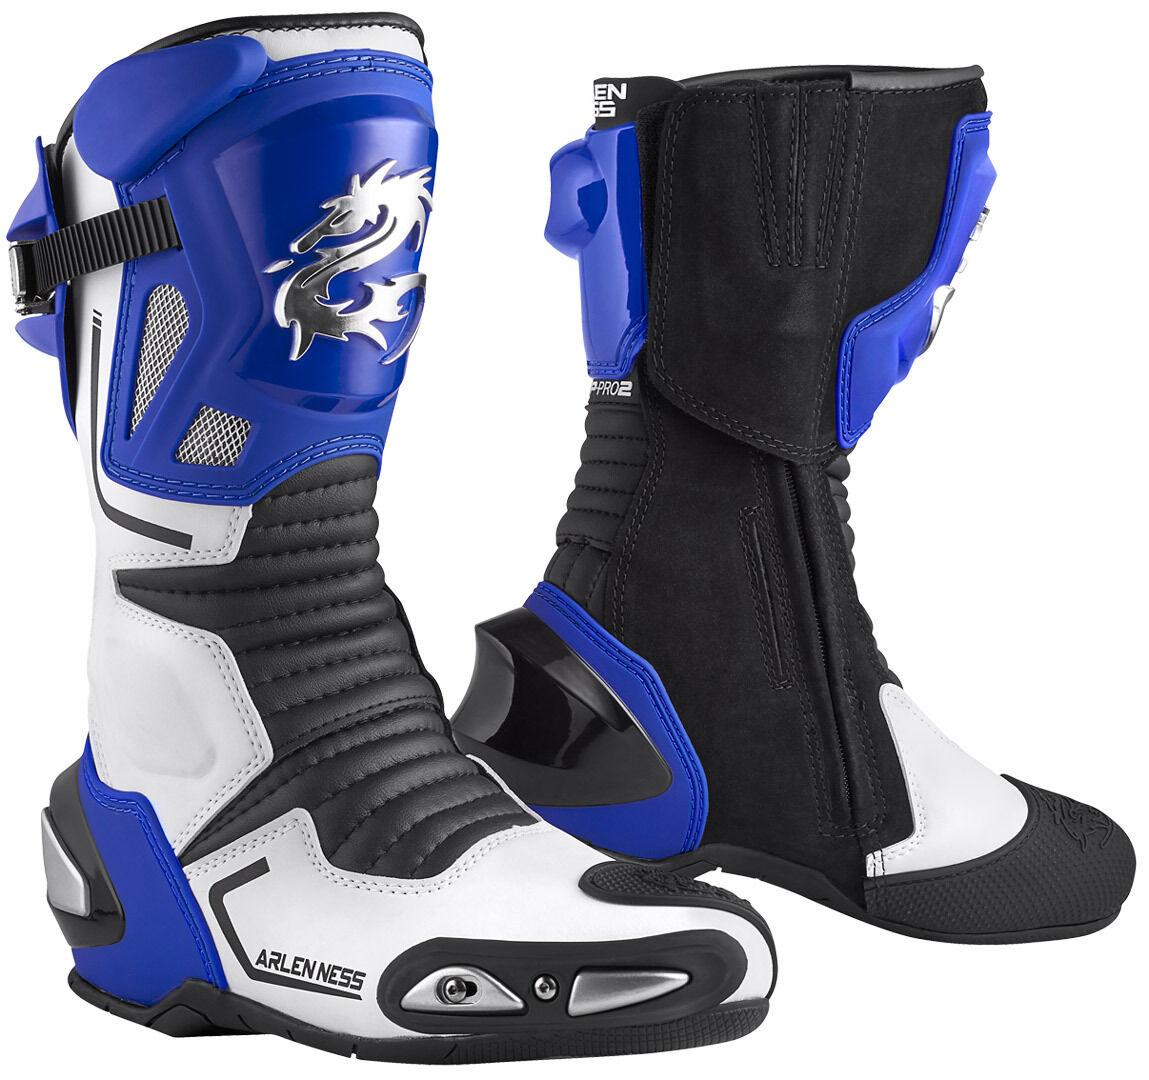 Arlen Ness Sugello Bottes de moto Noir Blanc Bleu taille : 39